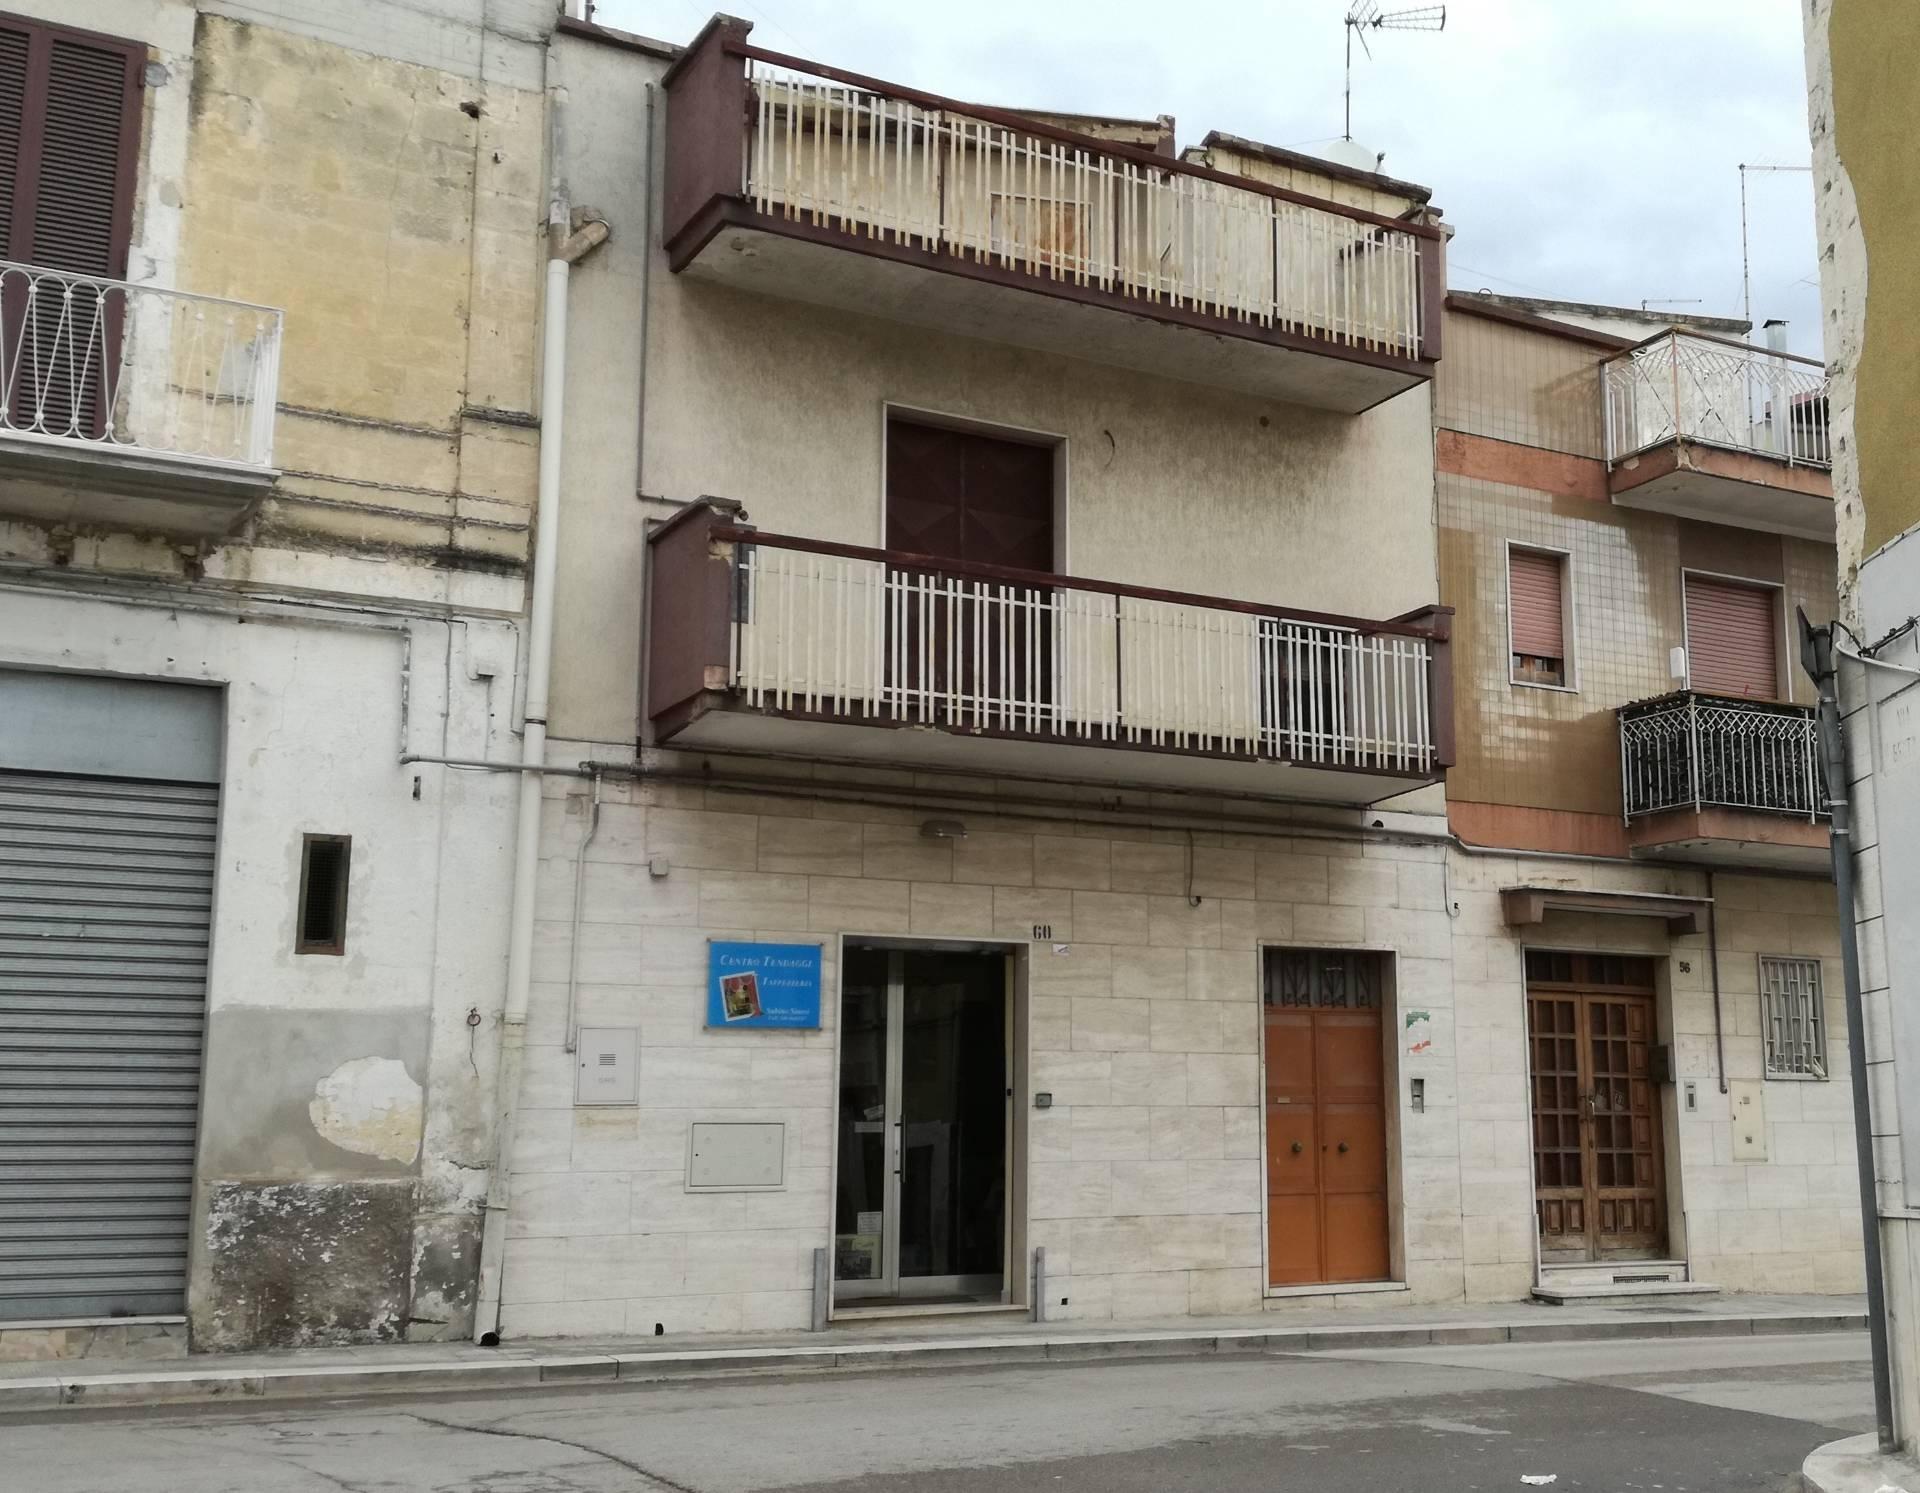 Casa singola in vendita a canosa di puglia cod r502 - Piano casa puglia ...